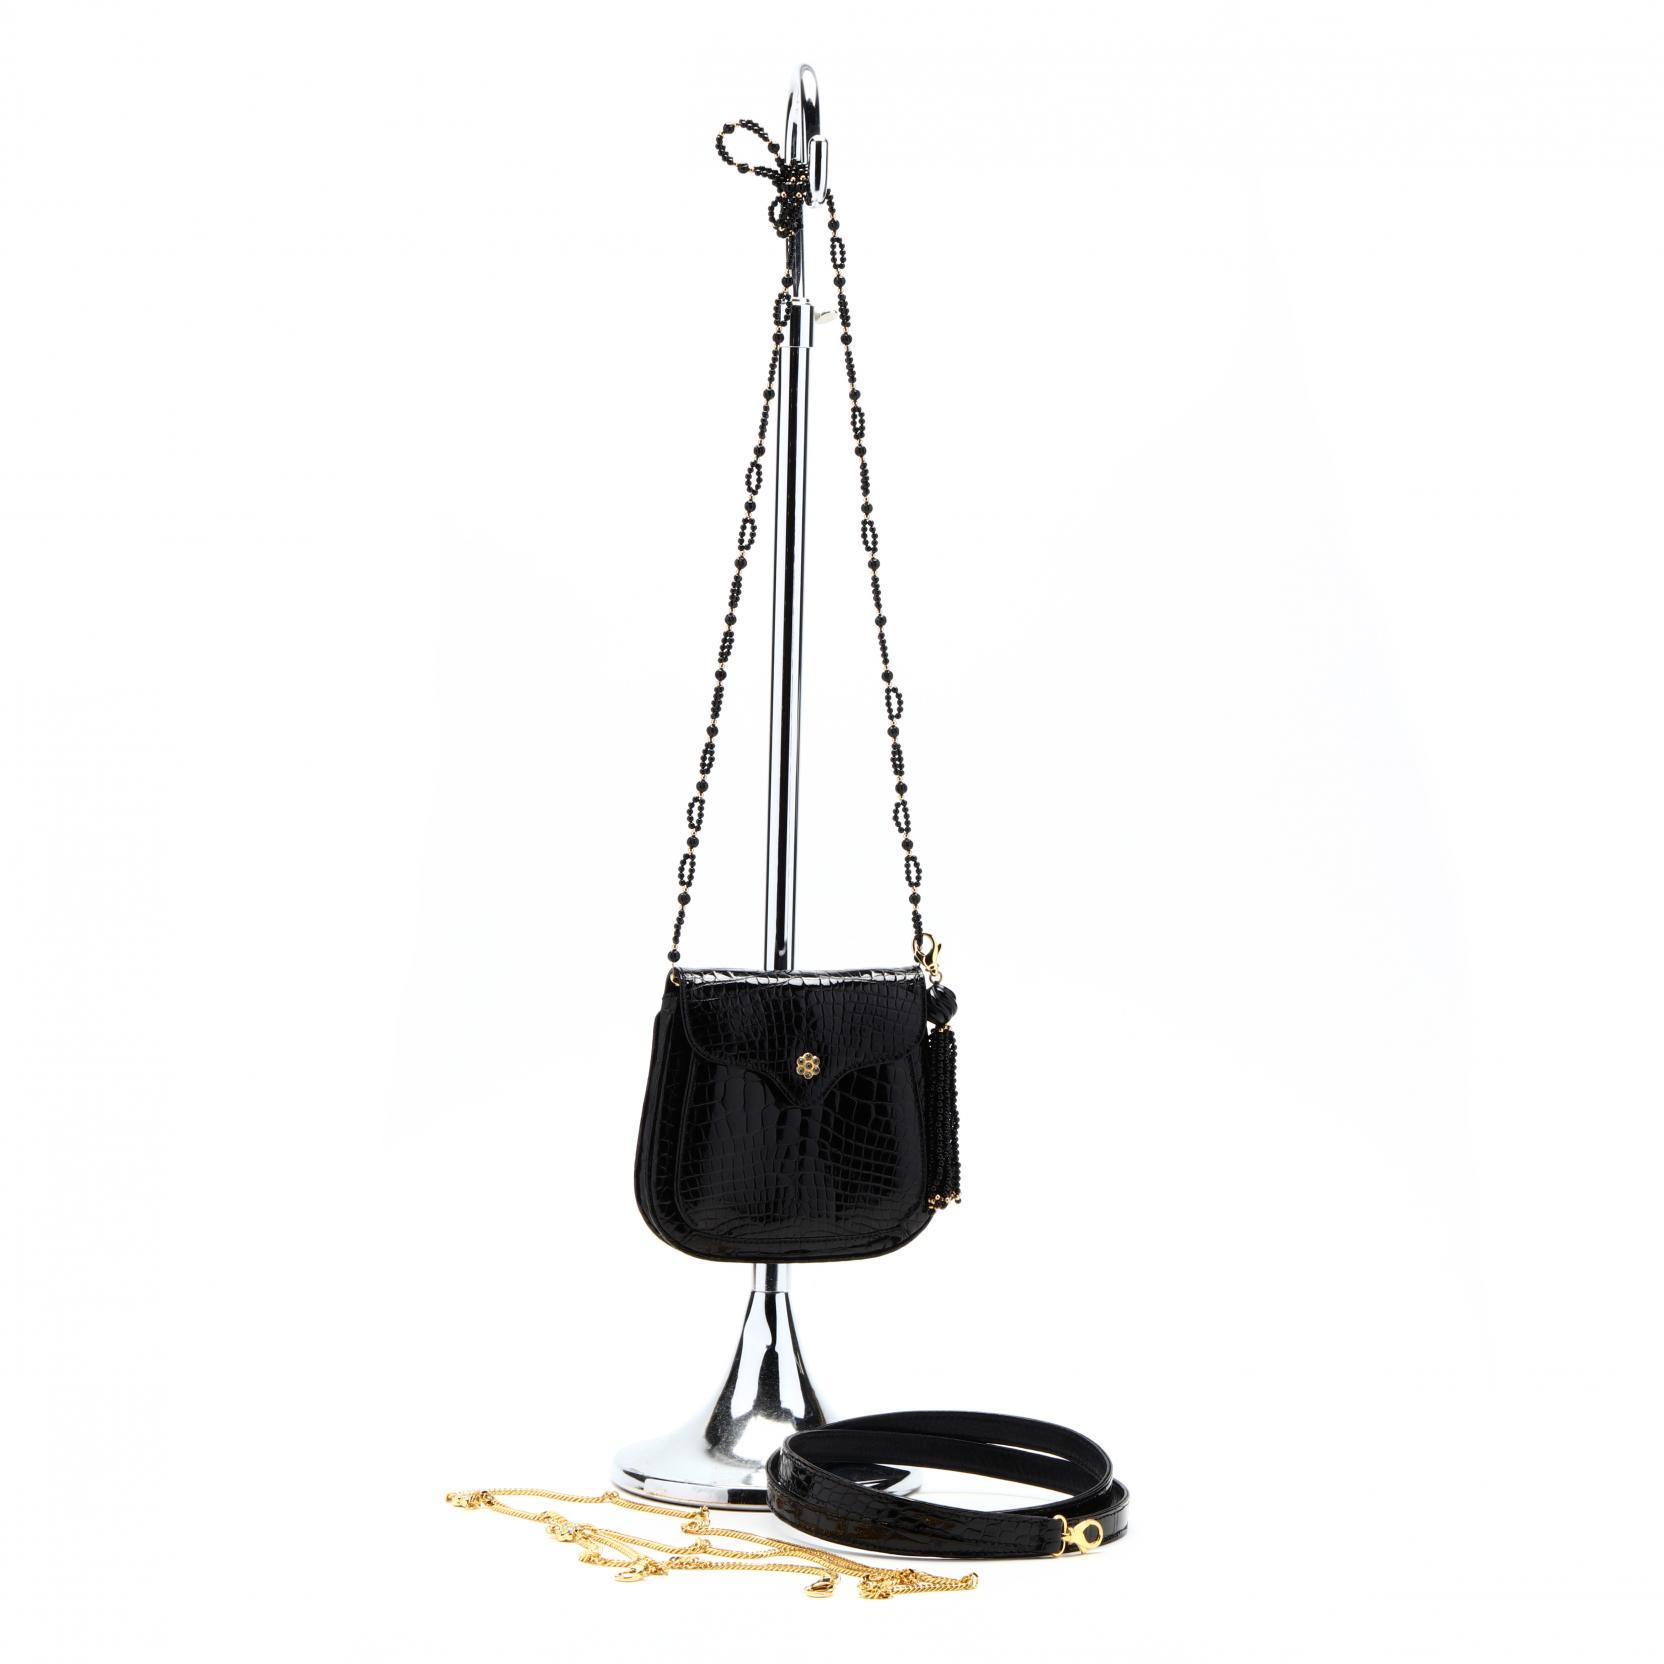 evening-bag-ensemble-lana-marks